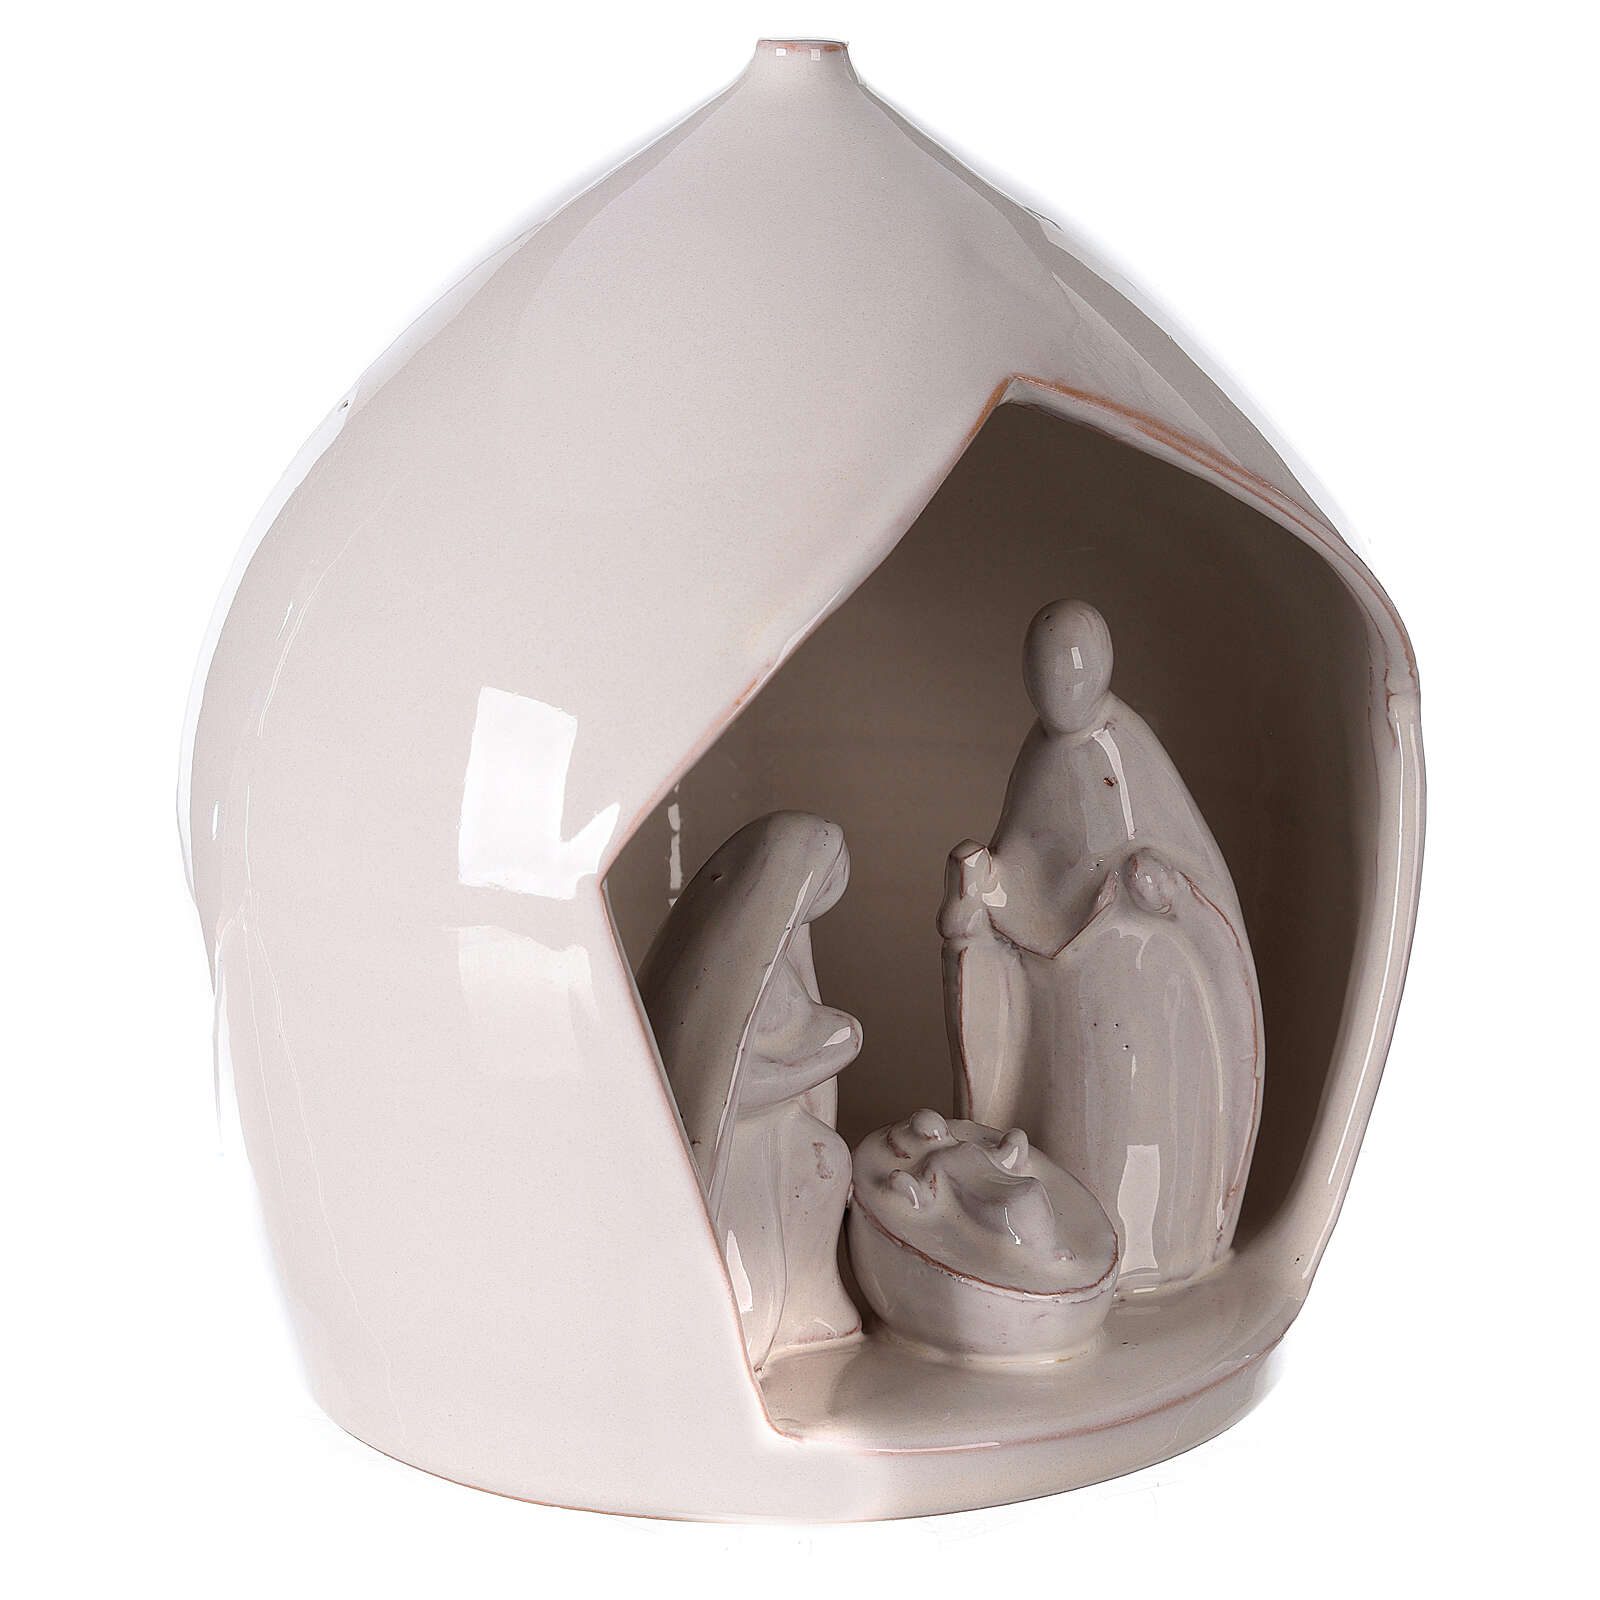 Presepe terracotta bianca apertura squadrata Sacra Famiglia Deruta 20x18 cm  4